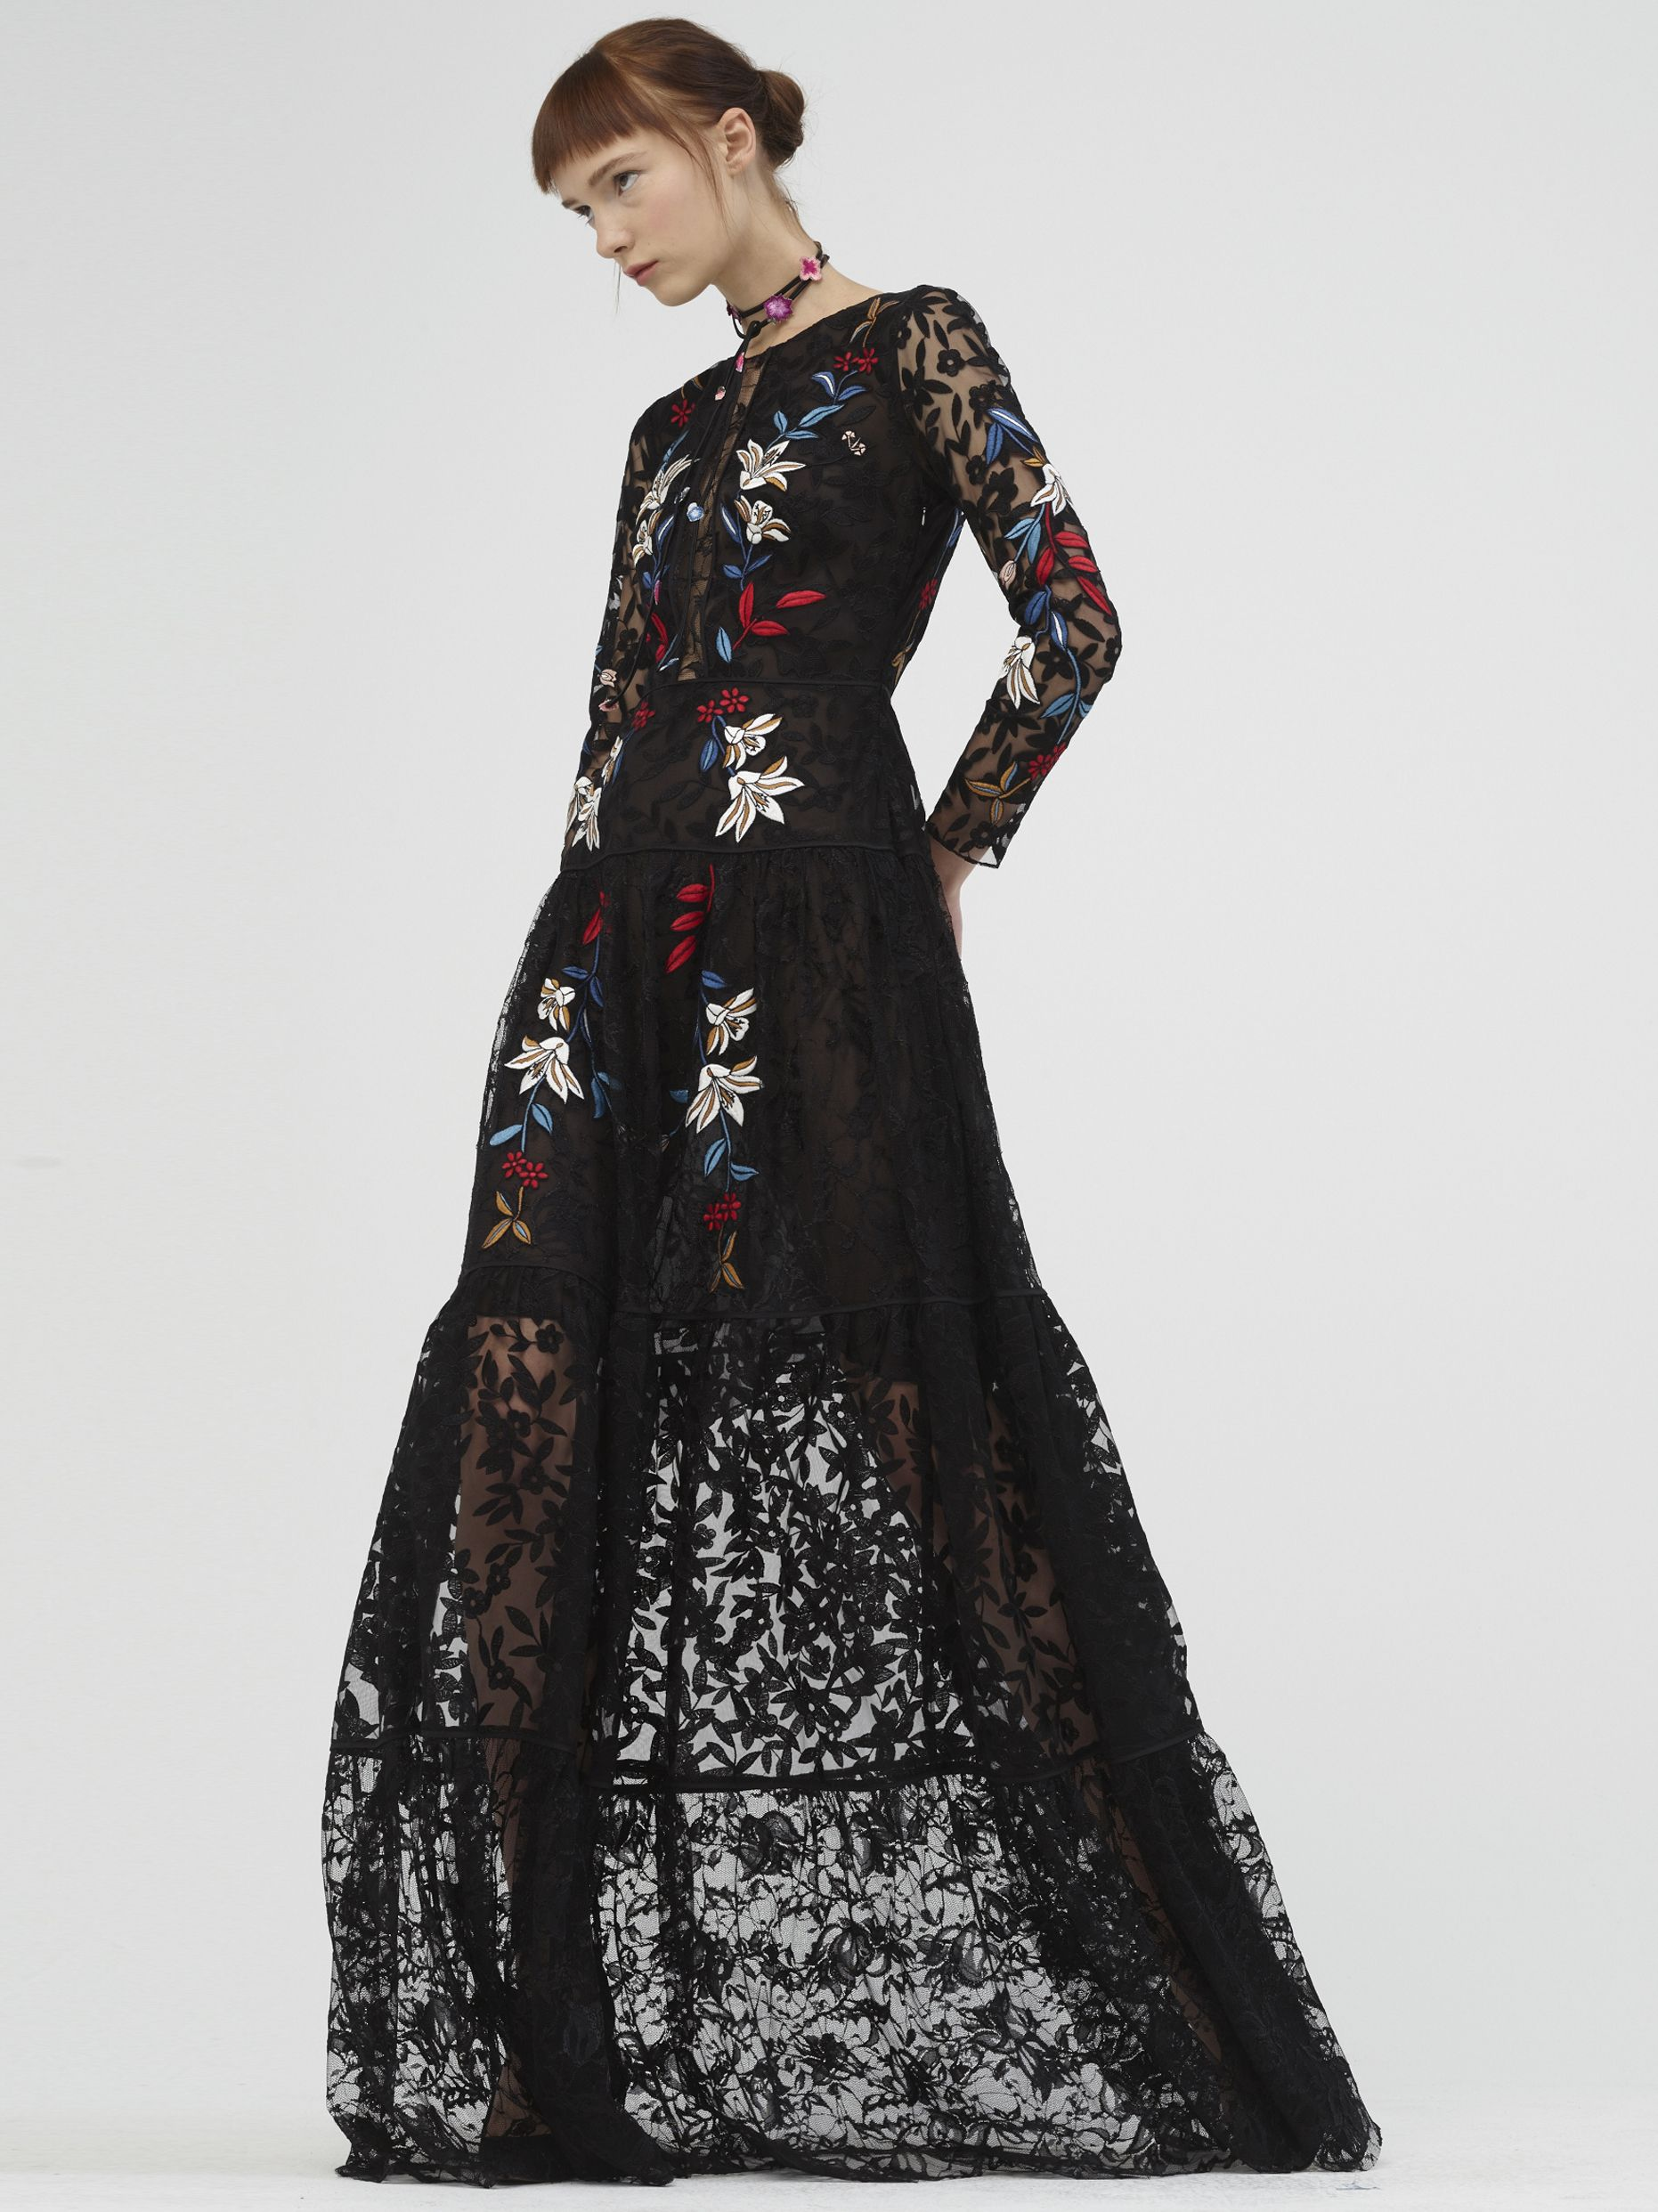 01d09a7d39e13 Spring Summer 2017 Sachin & Babi. Dupont gown: Jet lace long sleeve ...